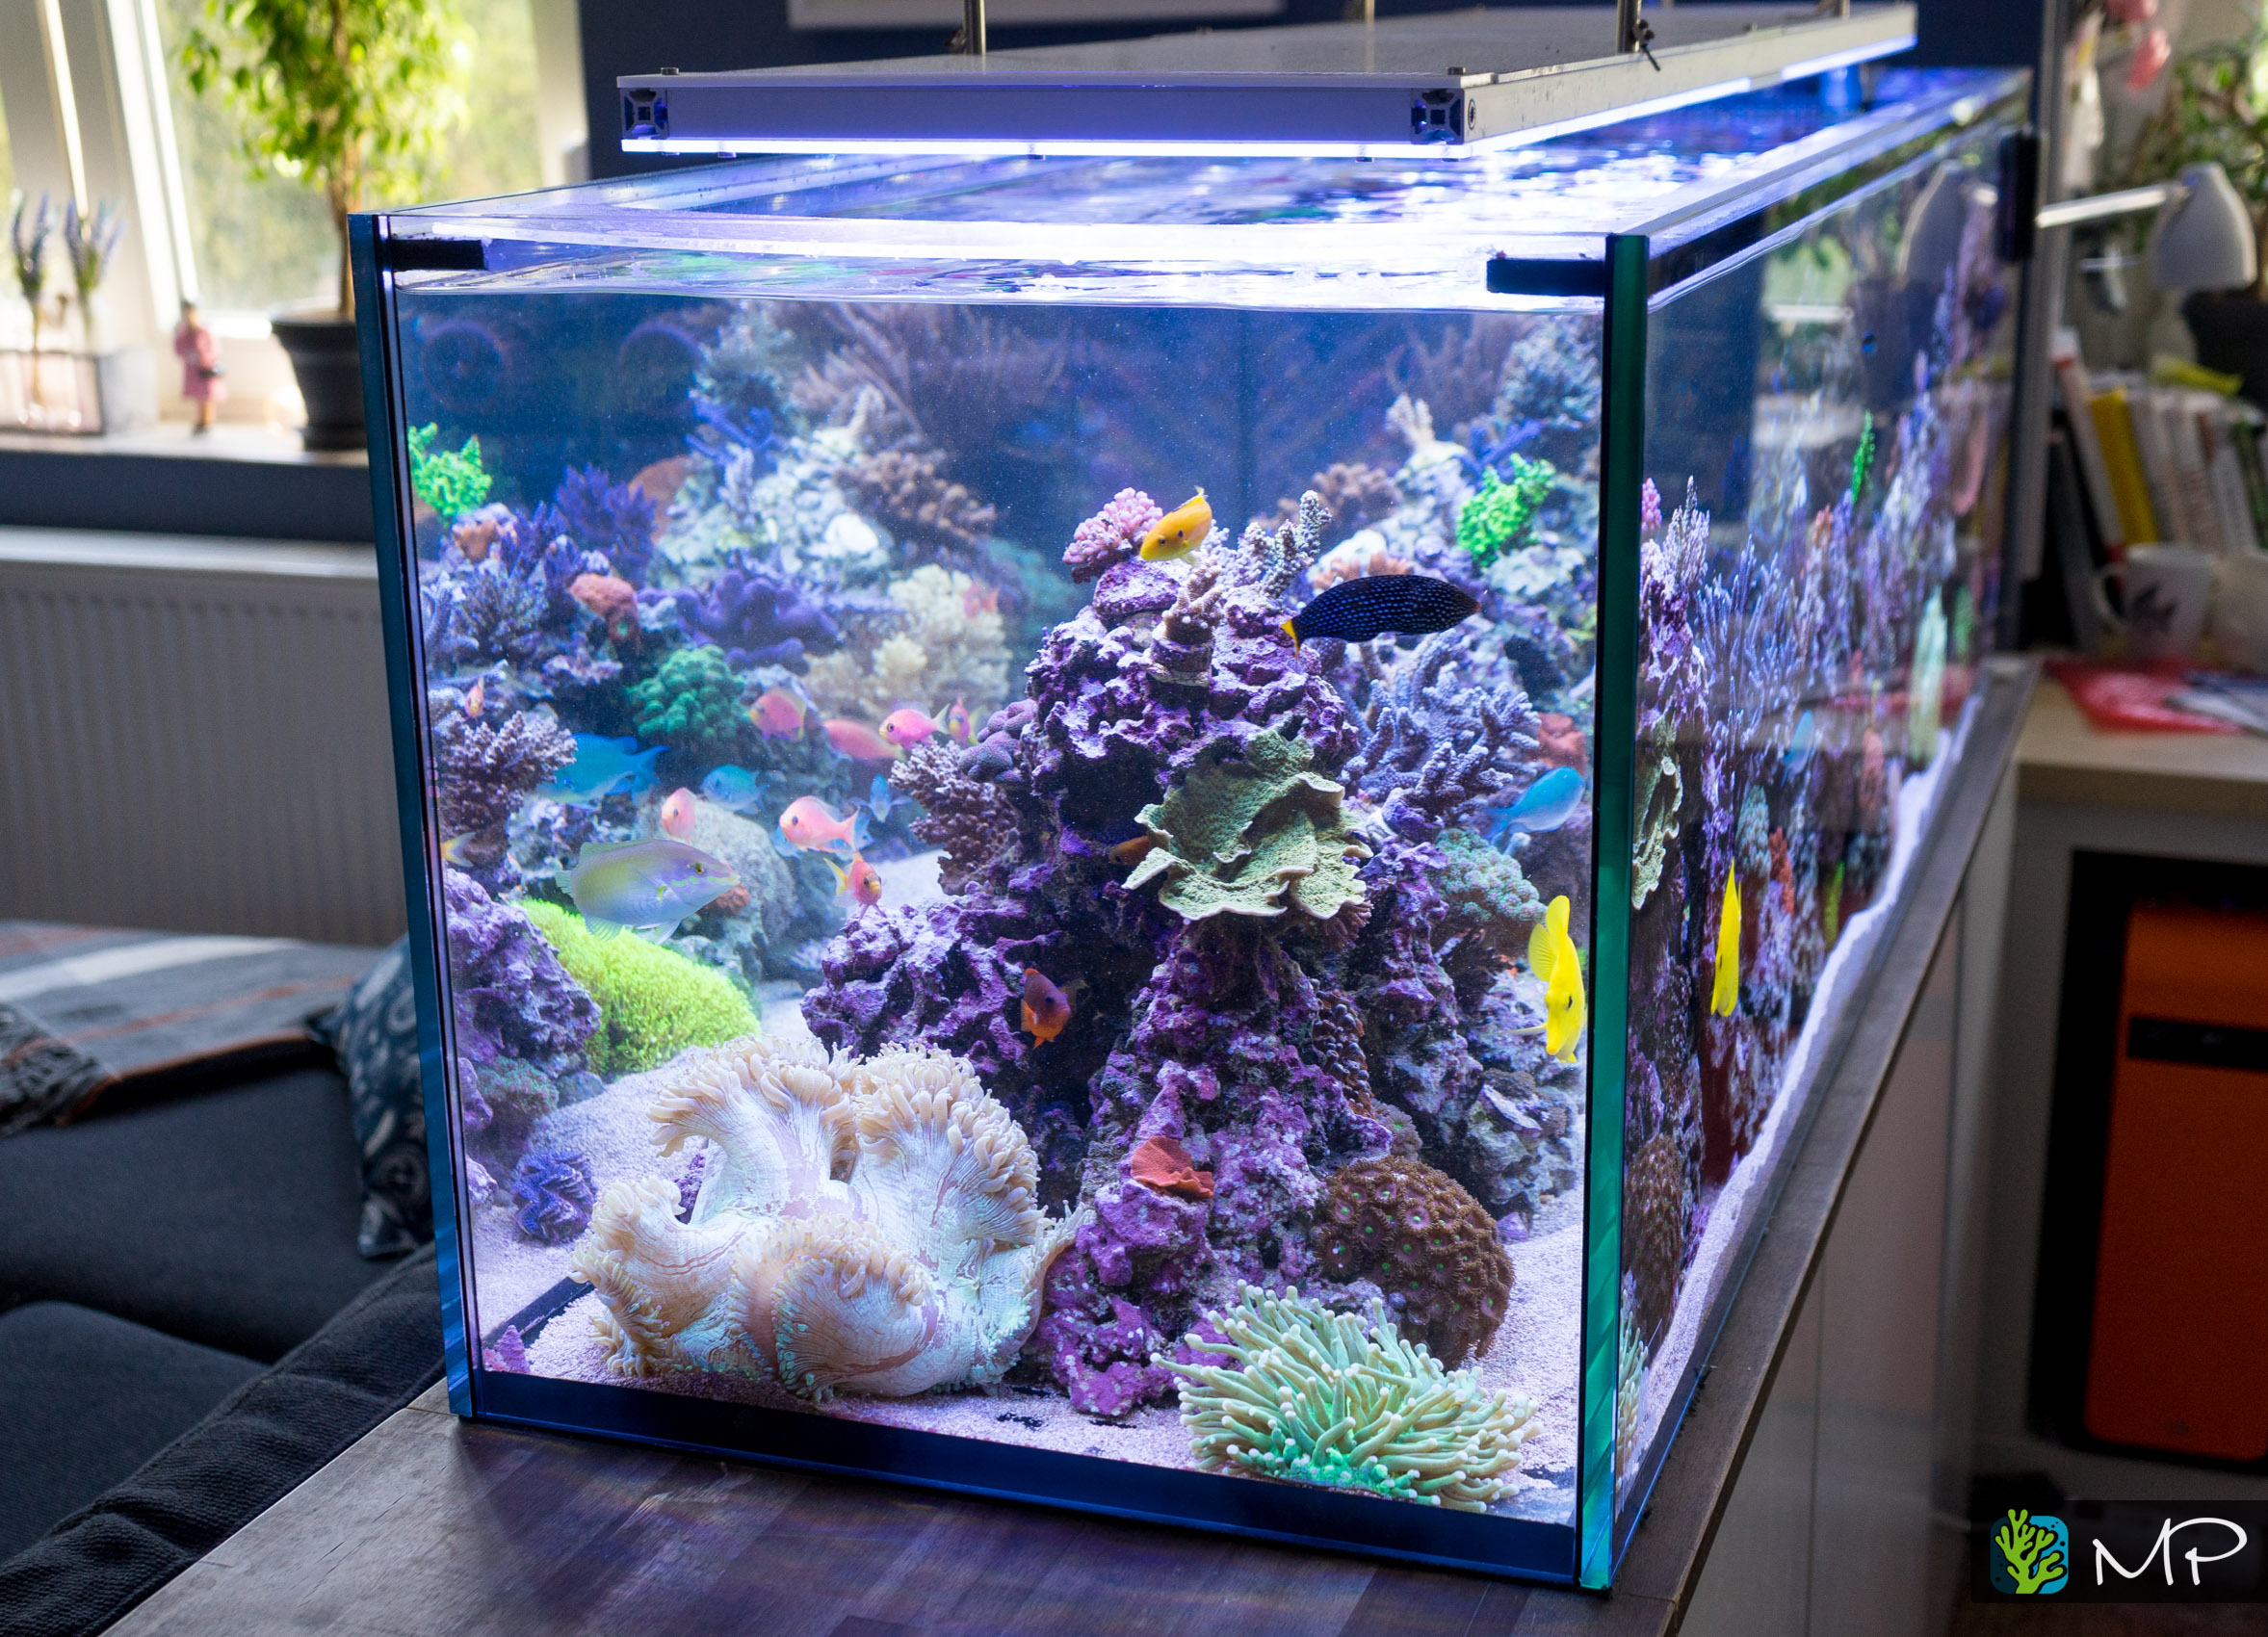 caribsea south sea base rock aufbau dein meerwasser. Black Bedroom Furniture Sets. Home Design Ideas